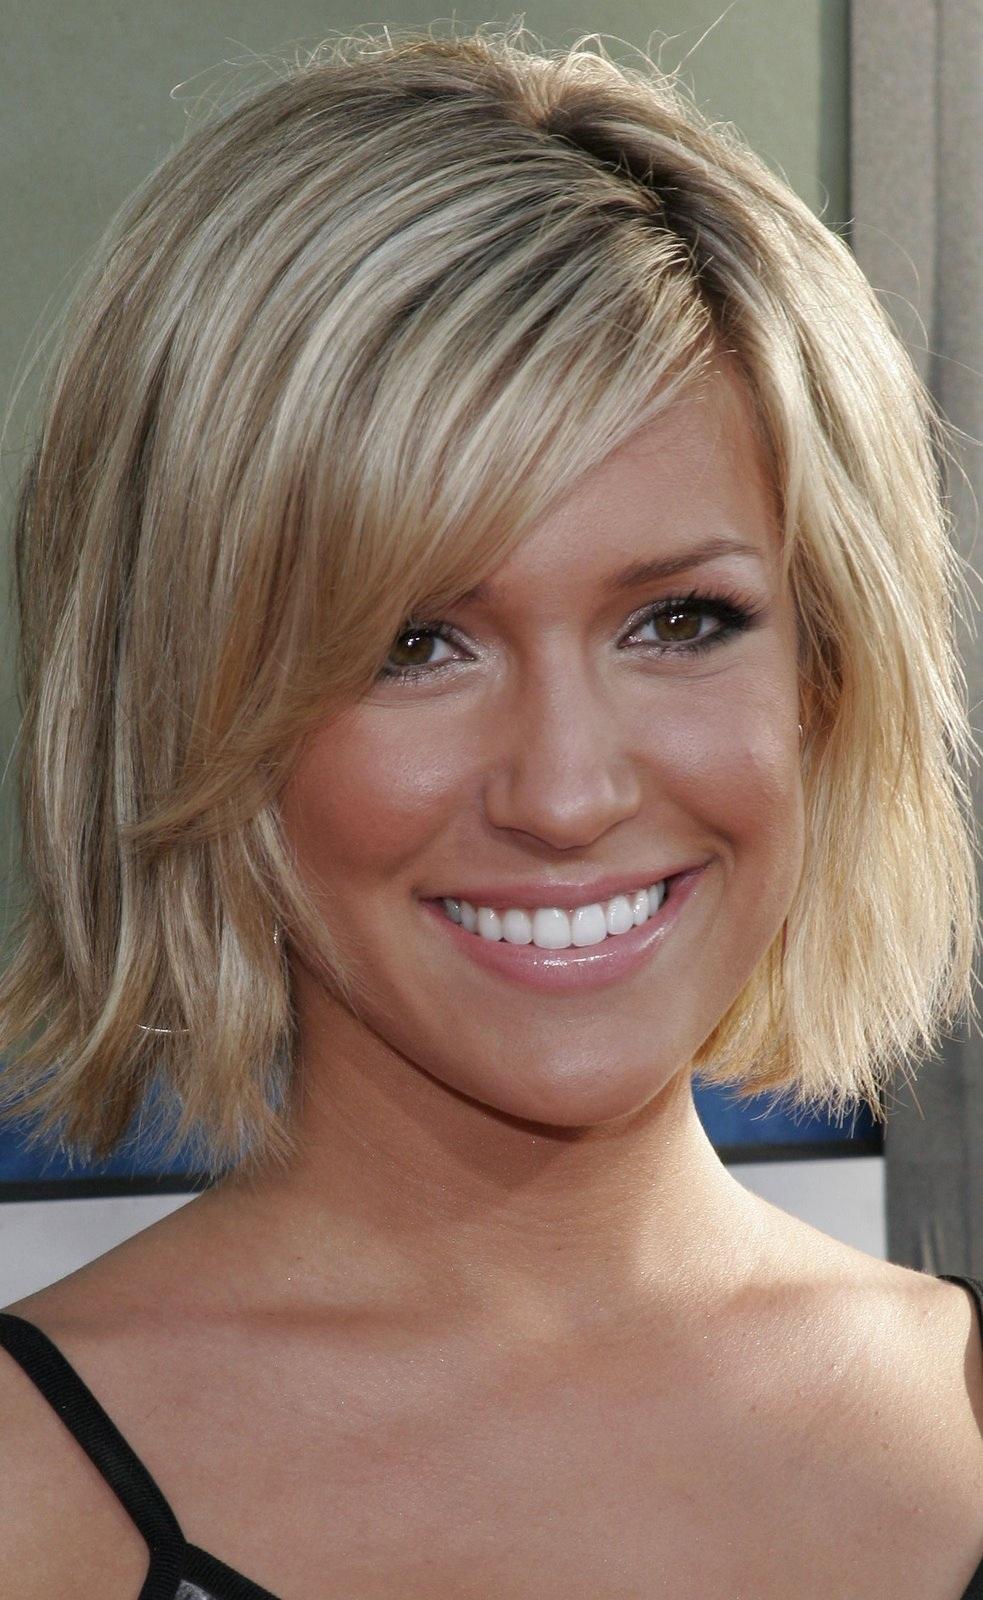 15 Fun Ideas That Will Make Love The Short Blonde